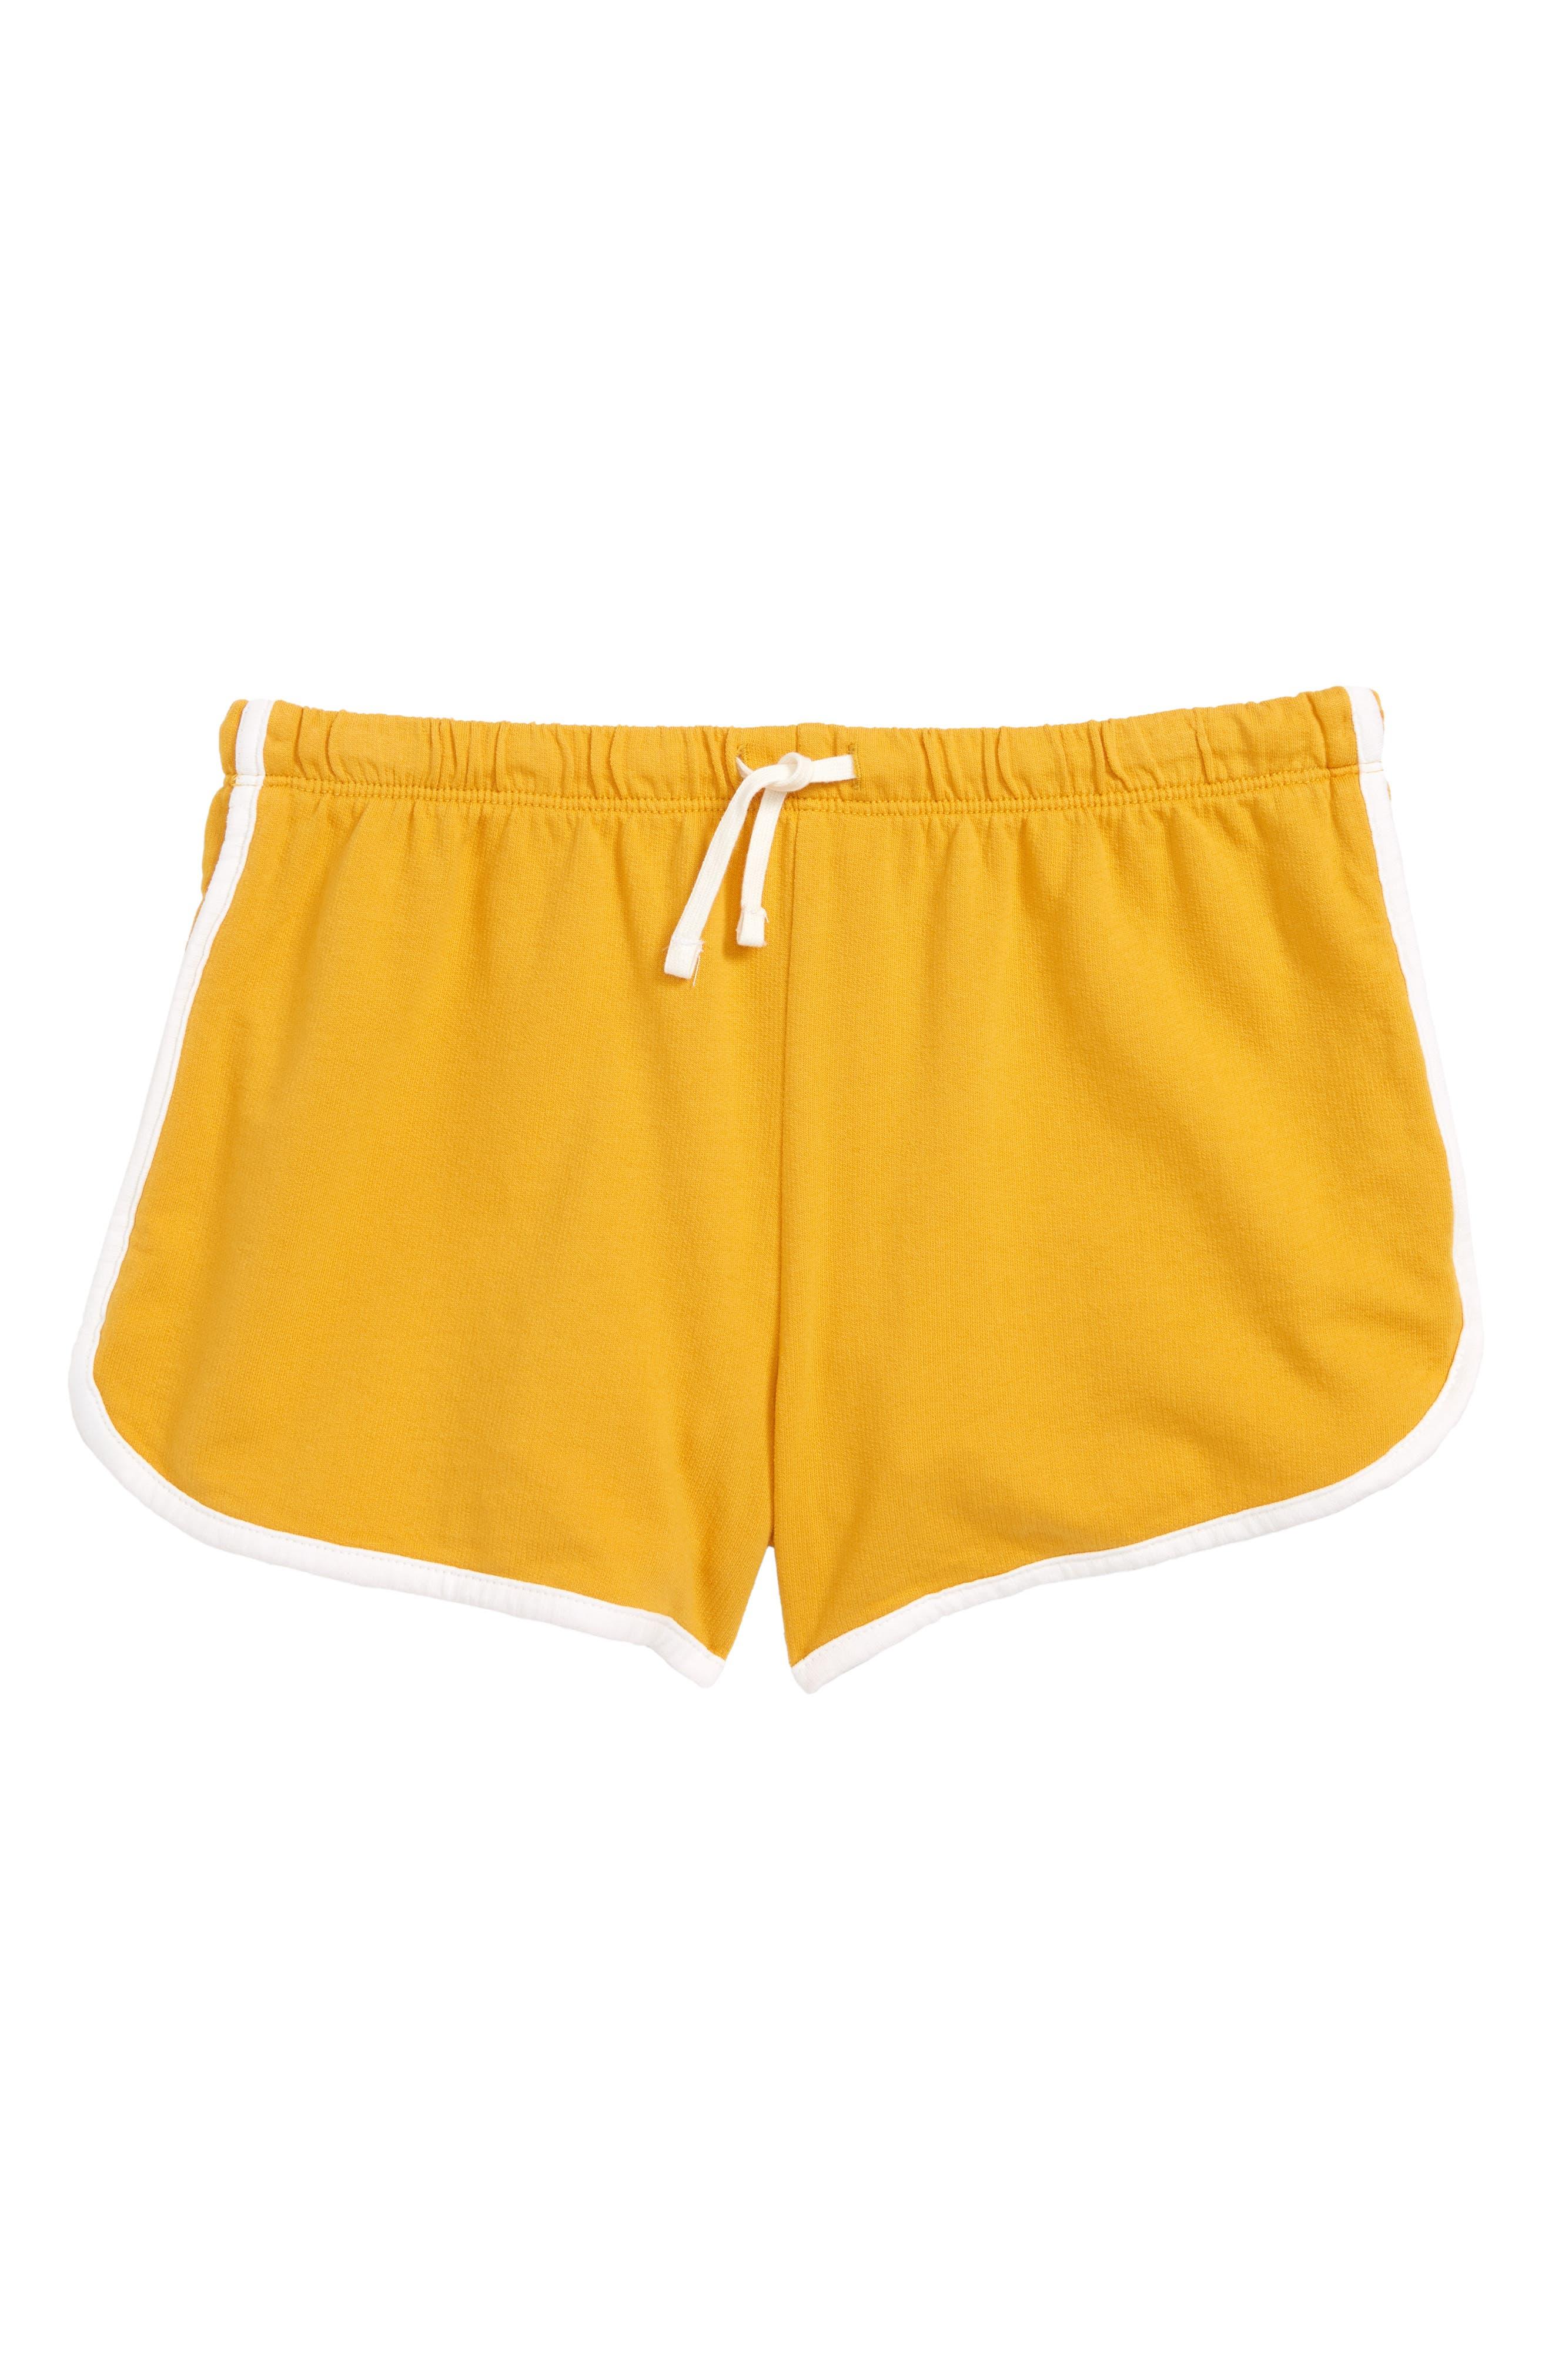 Cotton Dolphin Shorts,                             Main thumbnail 5, color,